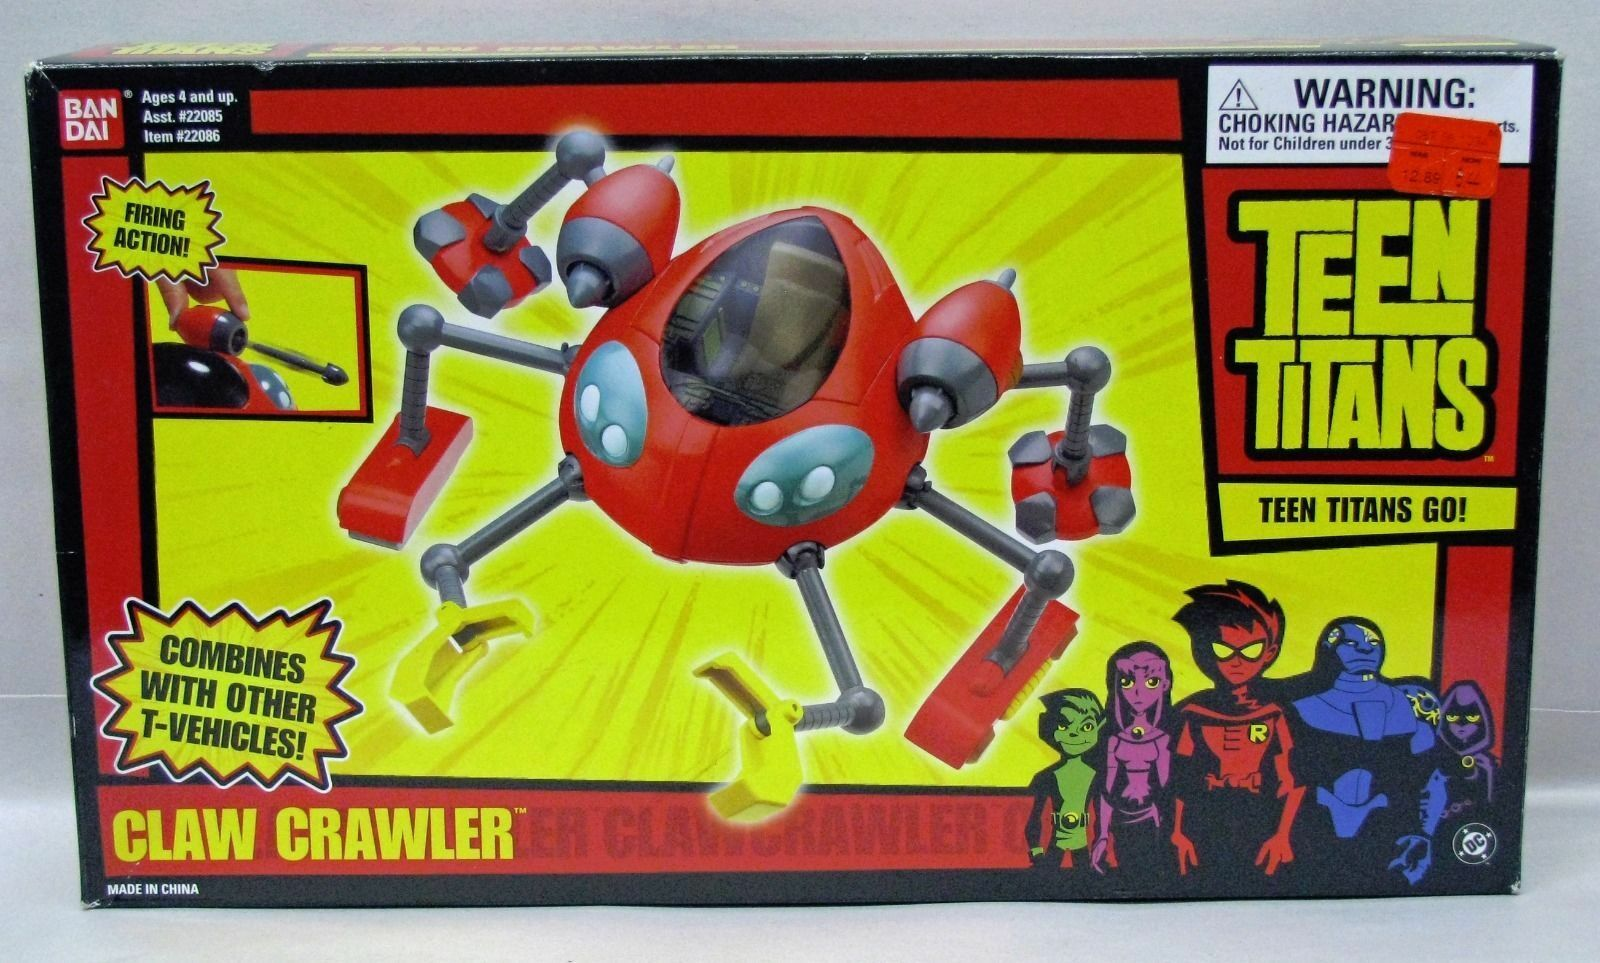 Teen Titans Animated Series Claw Crawler Vehicle BanDai NIP 4+ S115-8